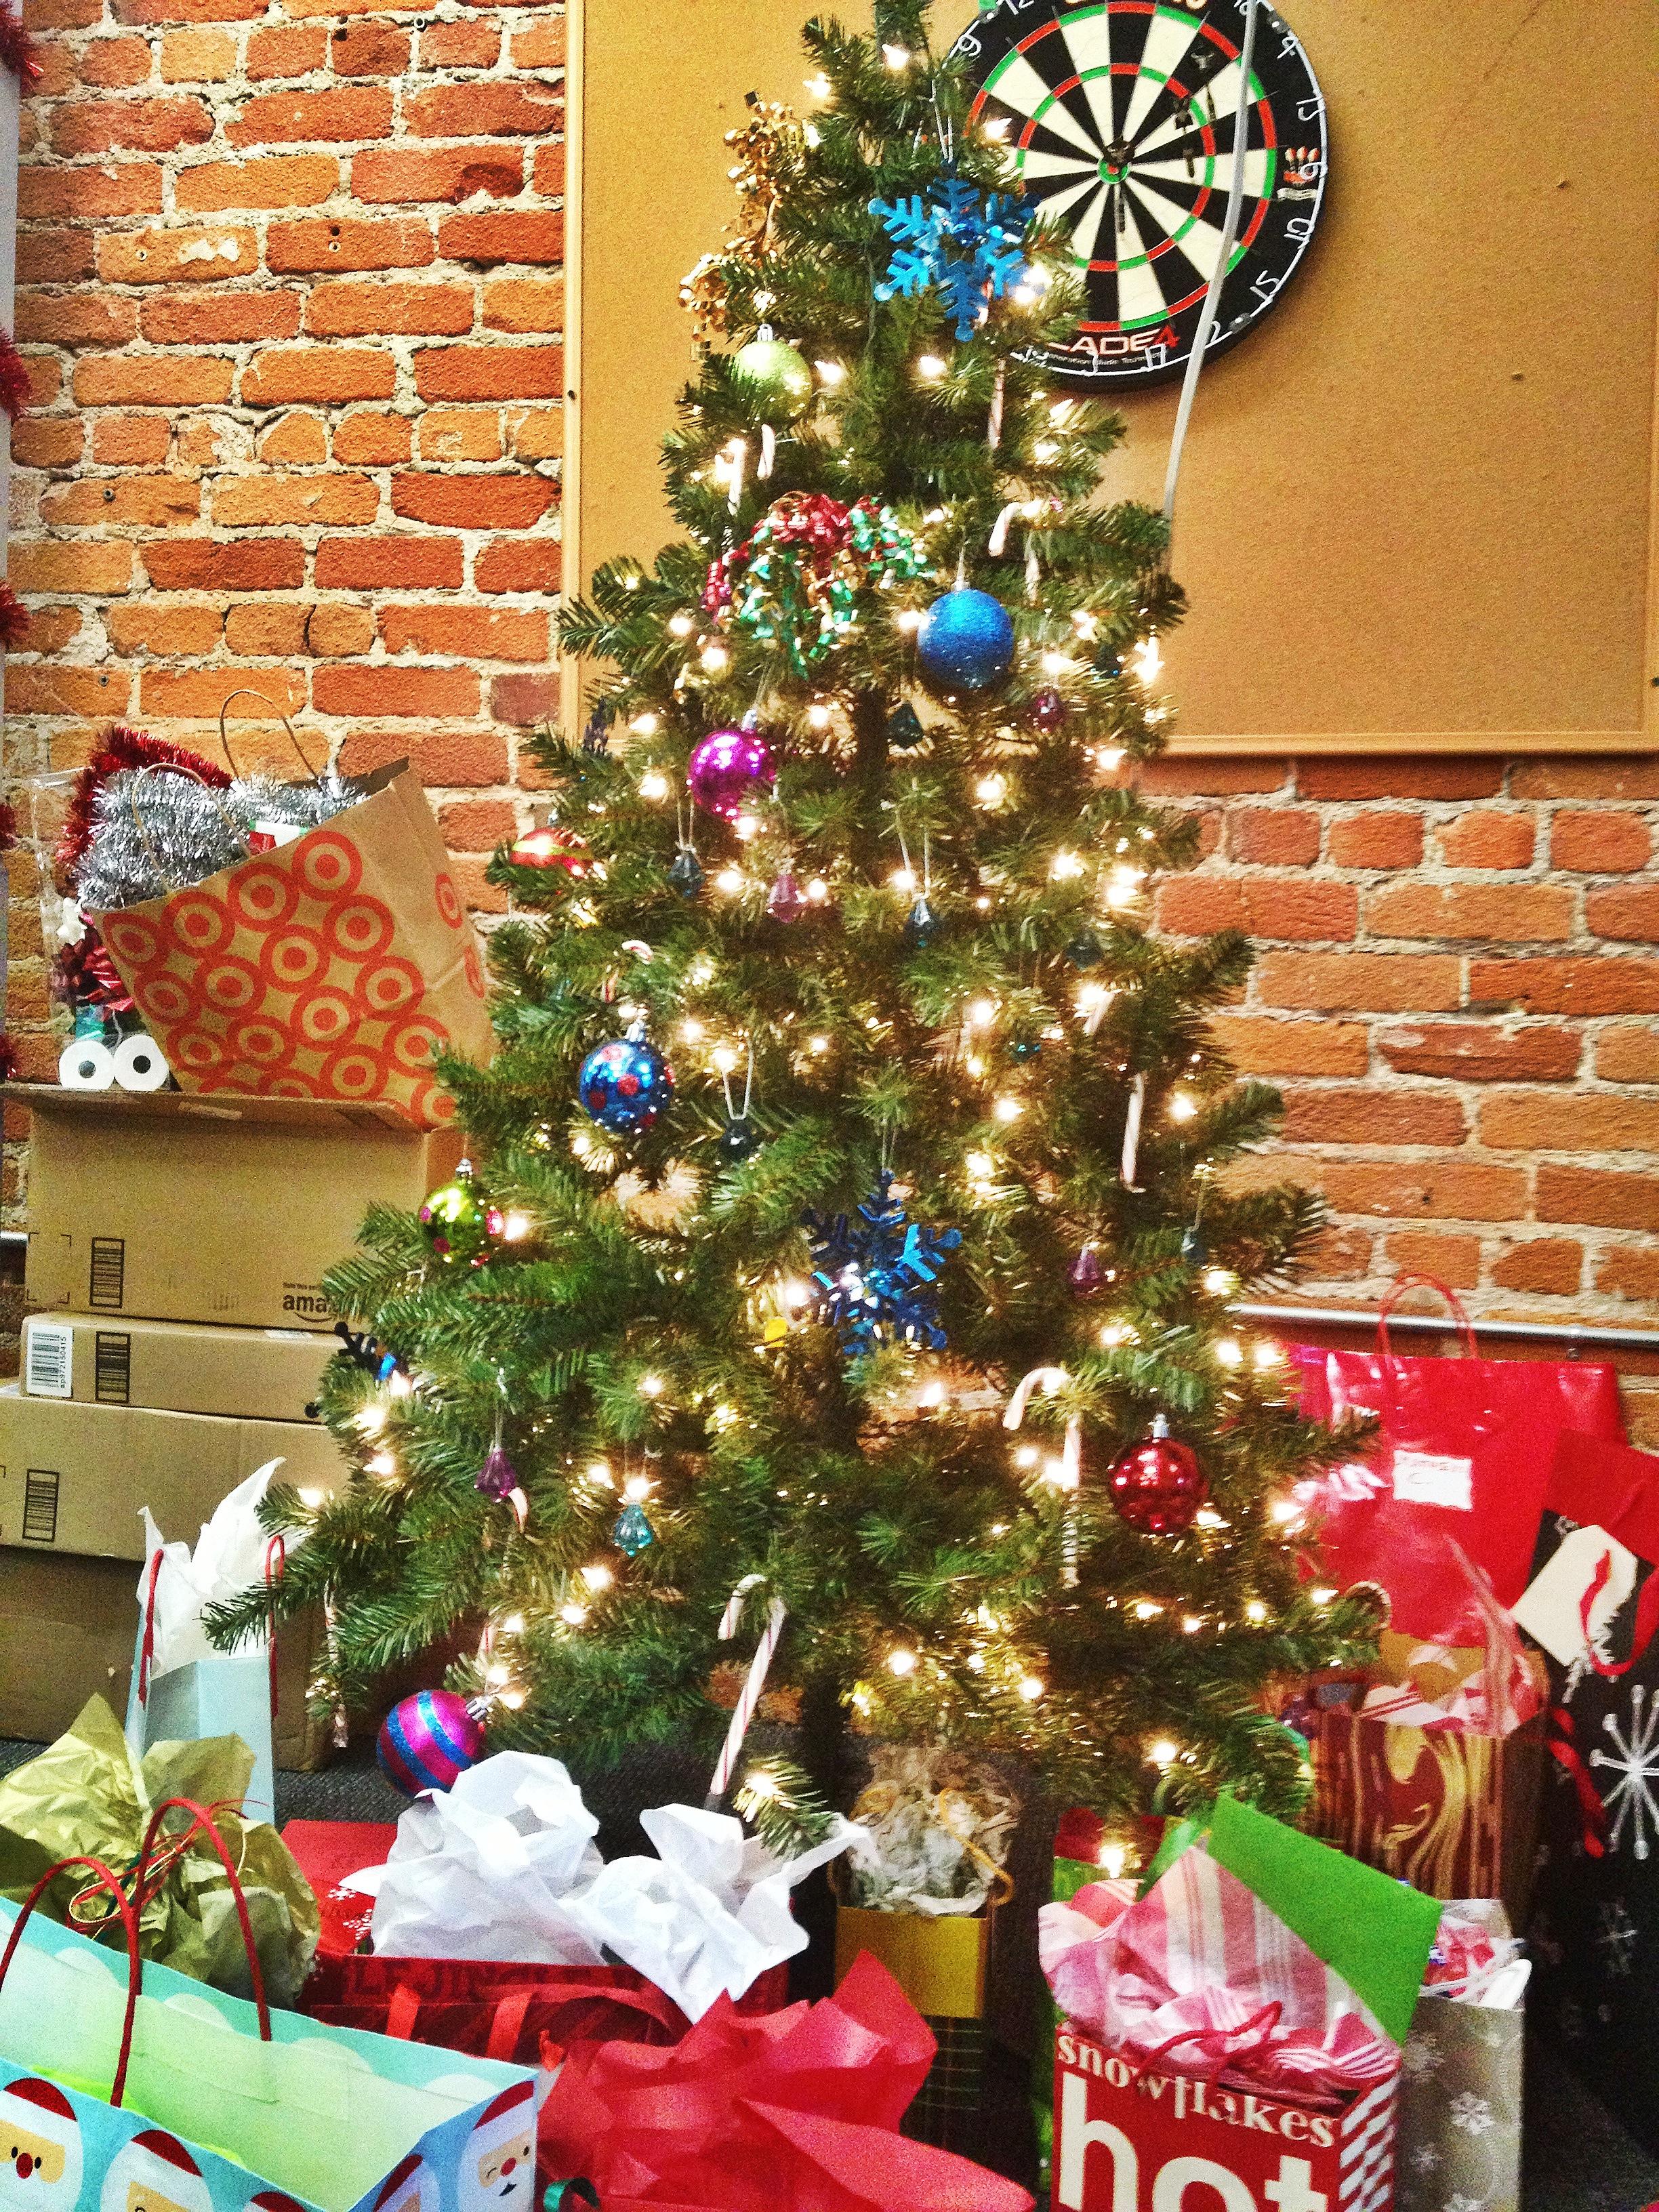 Happy Holidays from Vayner!